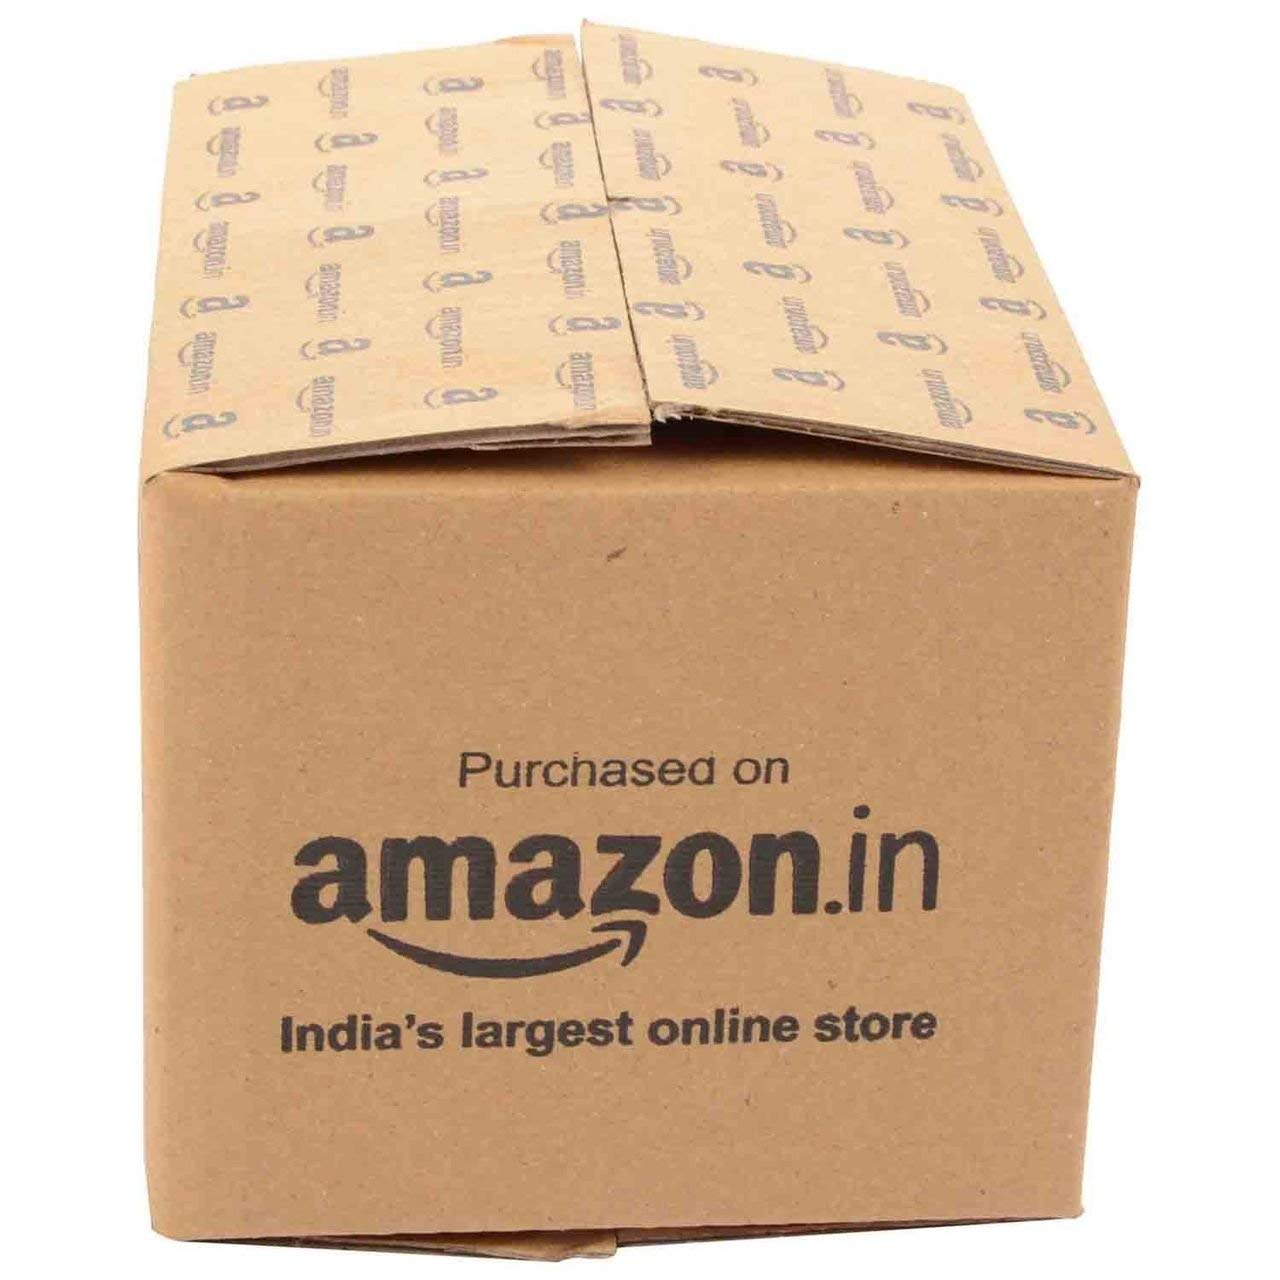 Amazon Corrugated Boxes (8 X 5 X 2 Inches)